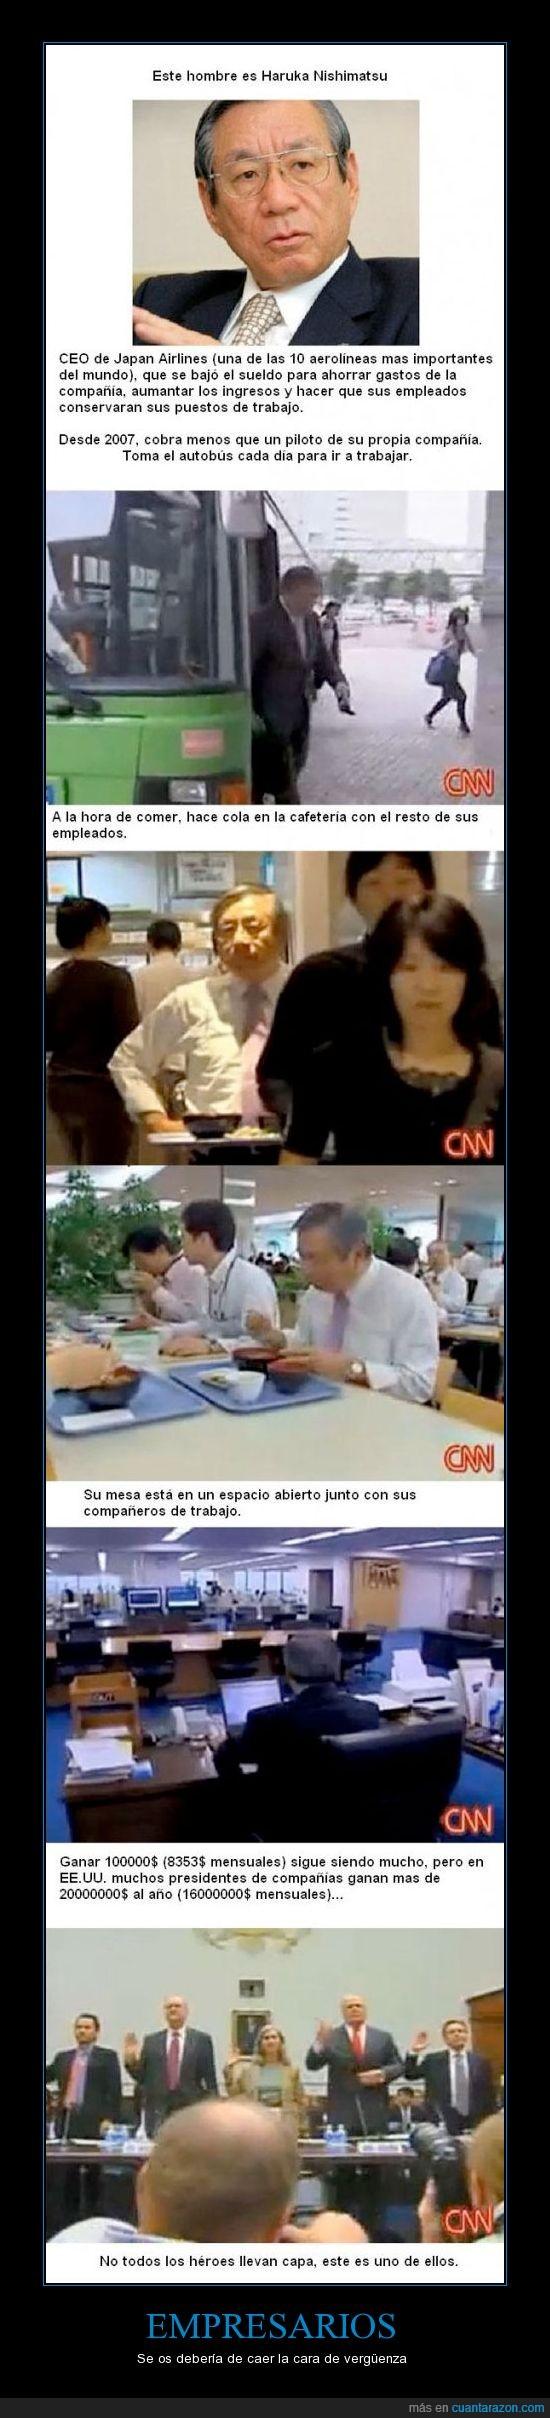 empresario,haruka nishimatsu,japan airlines,presidente,sueldo